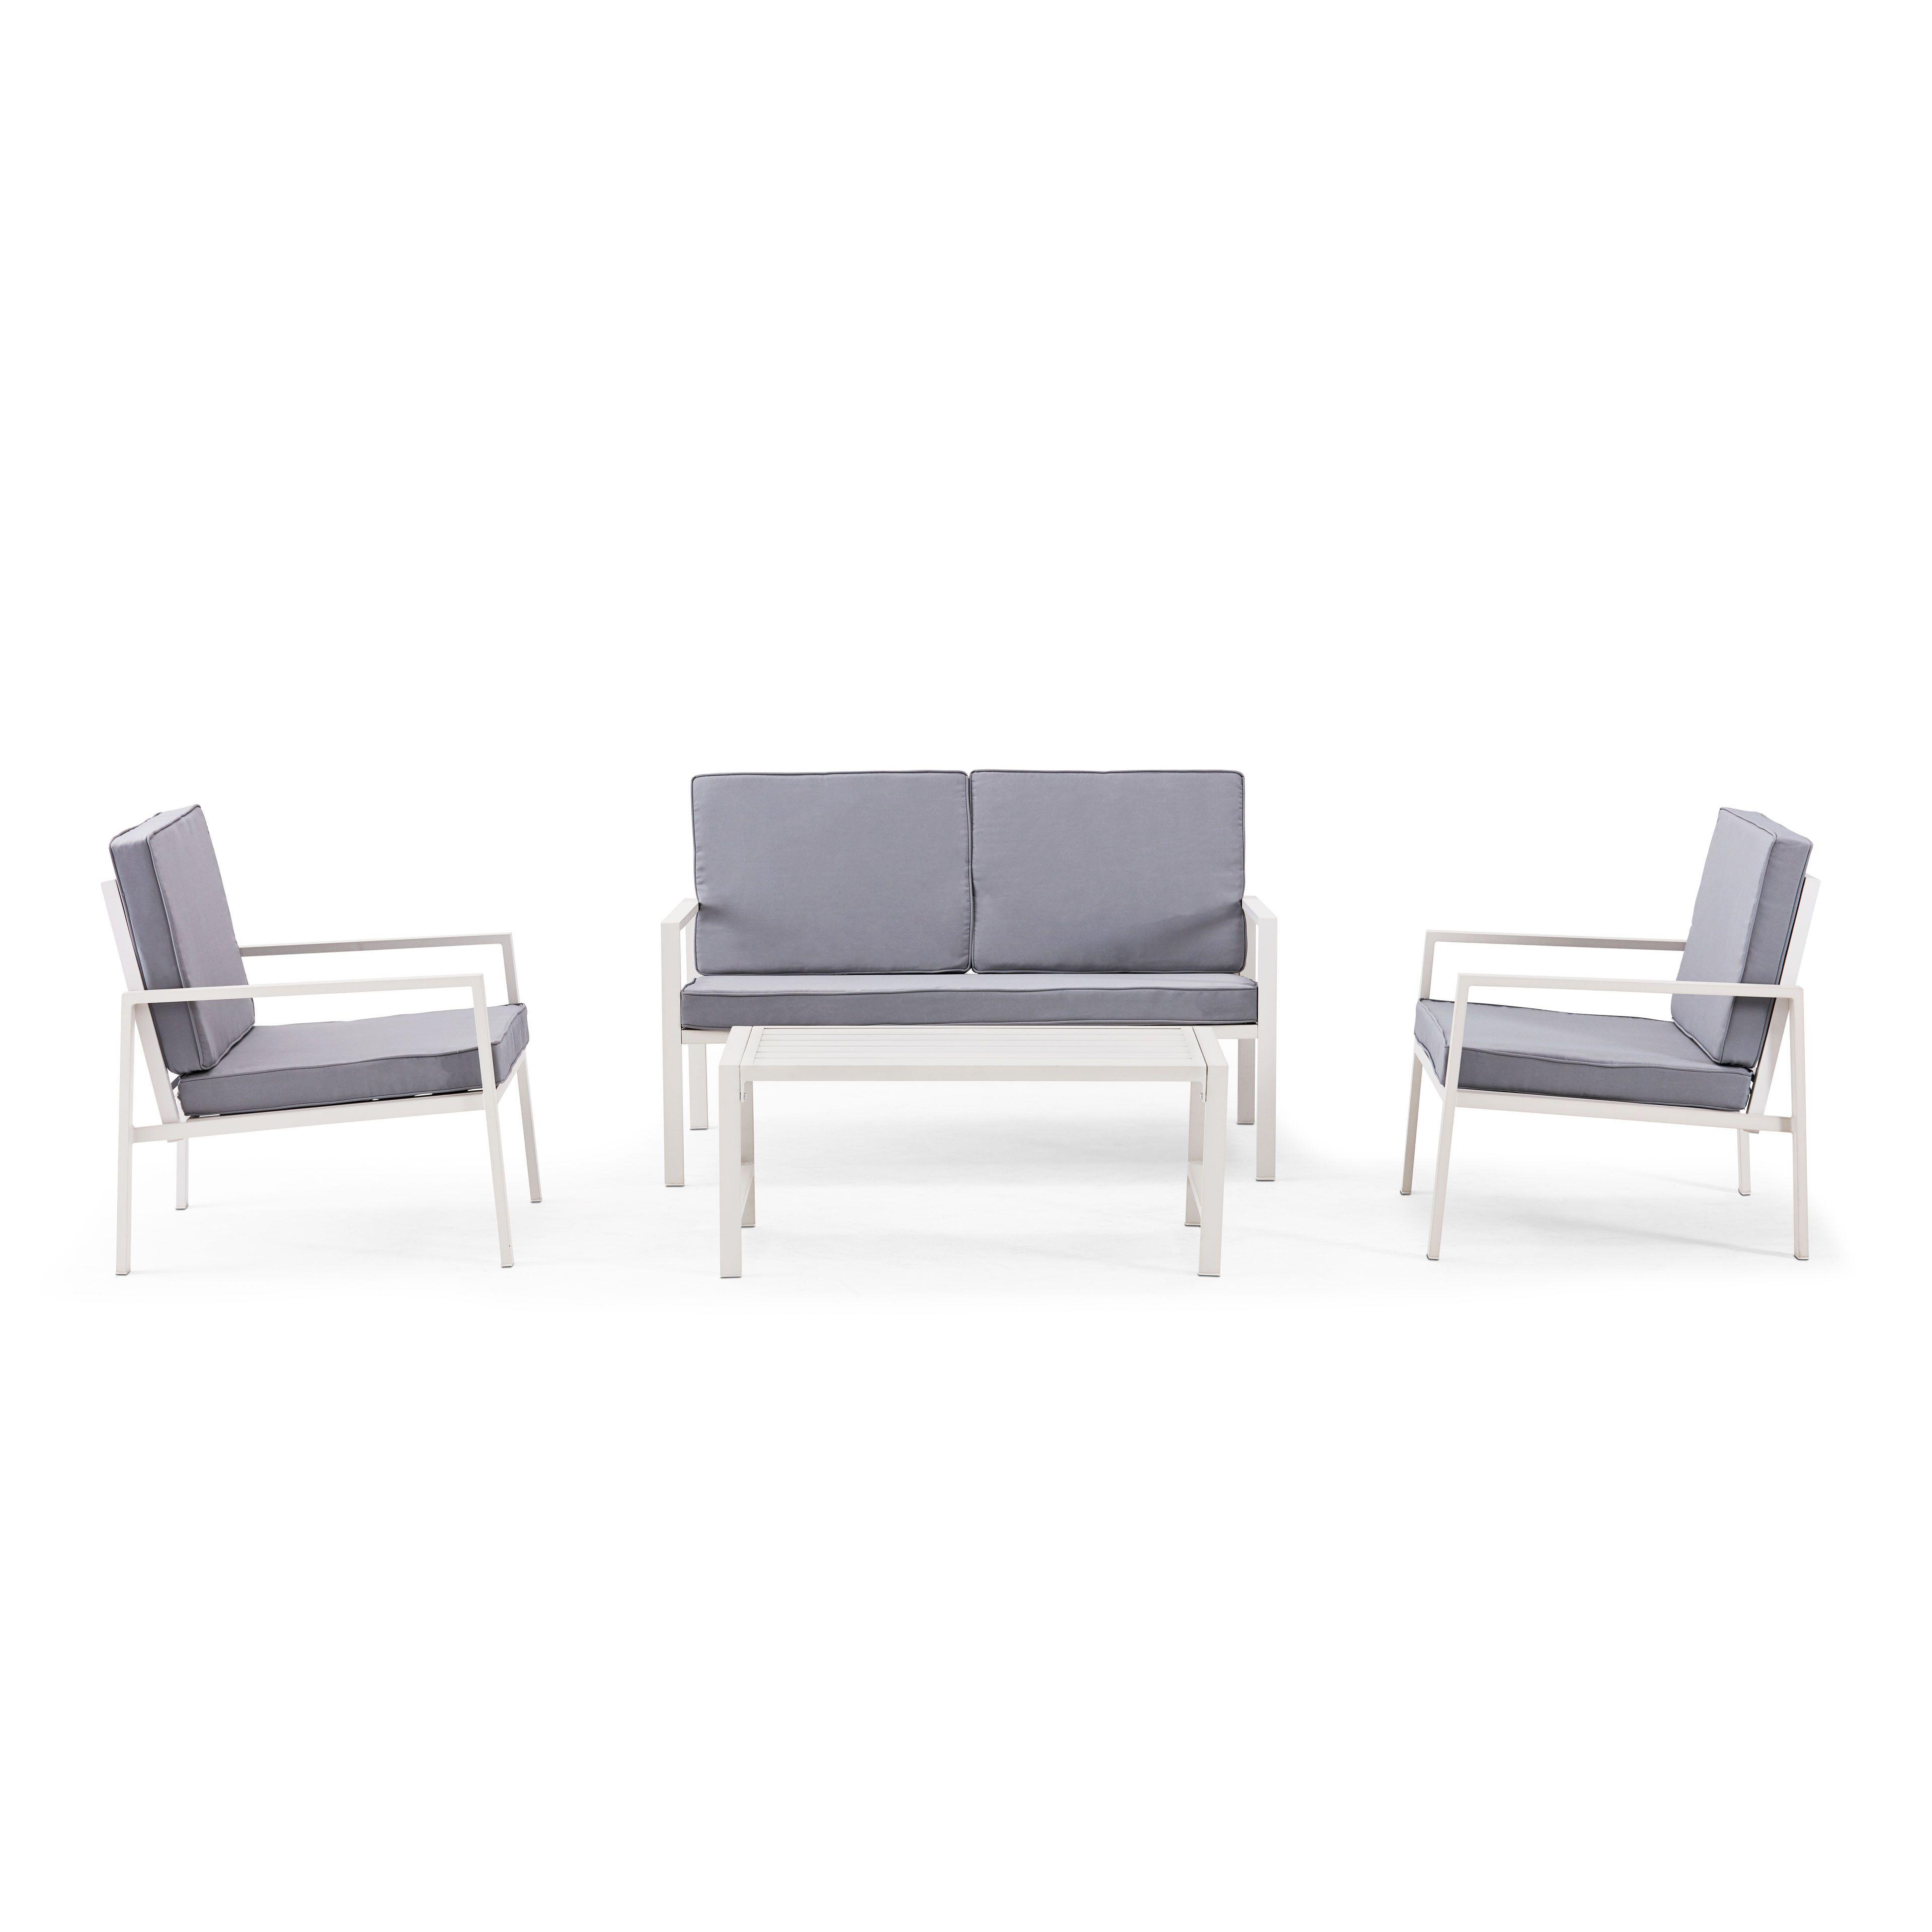 Salon jardin 4 places aluminium | Oviala